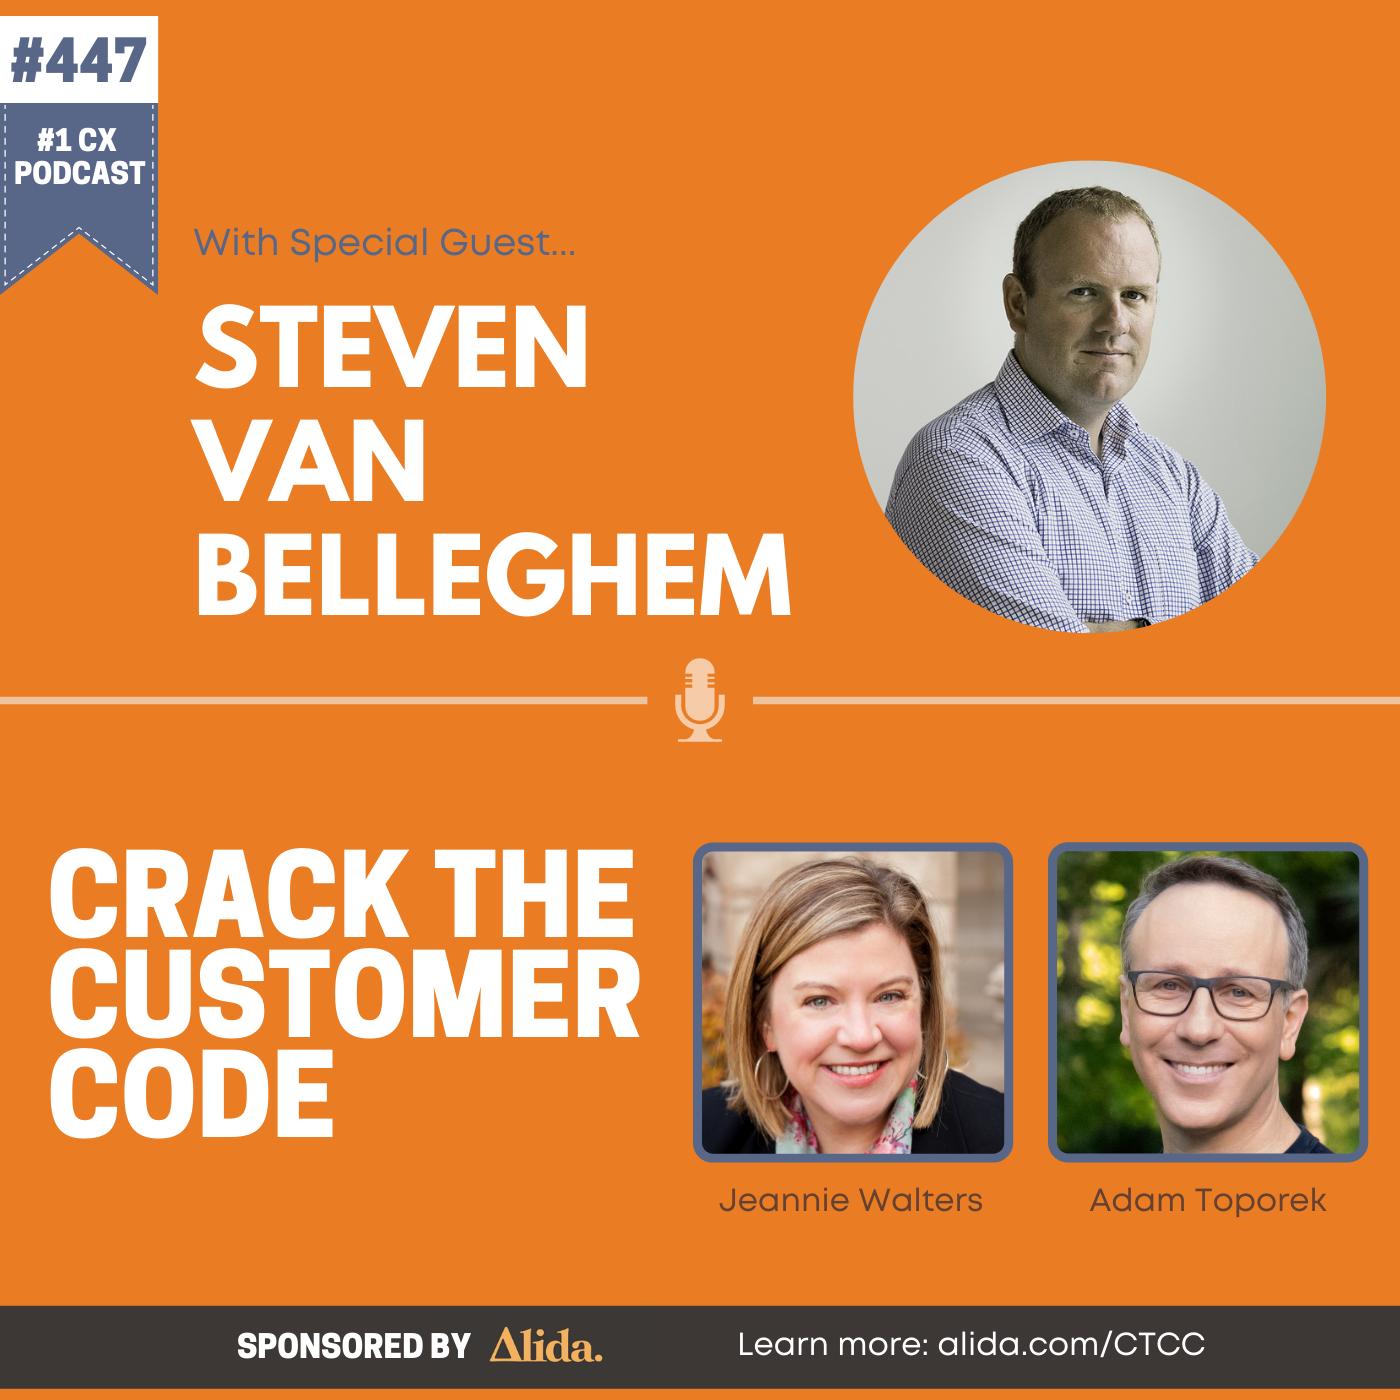 447: Steven Van Belleghem, The Offer You Can't Refuse